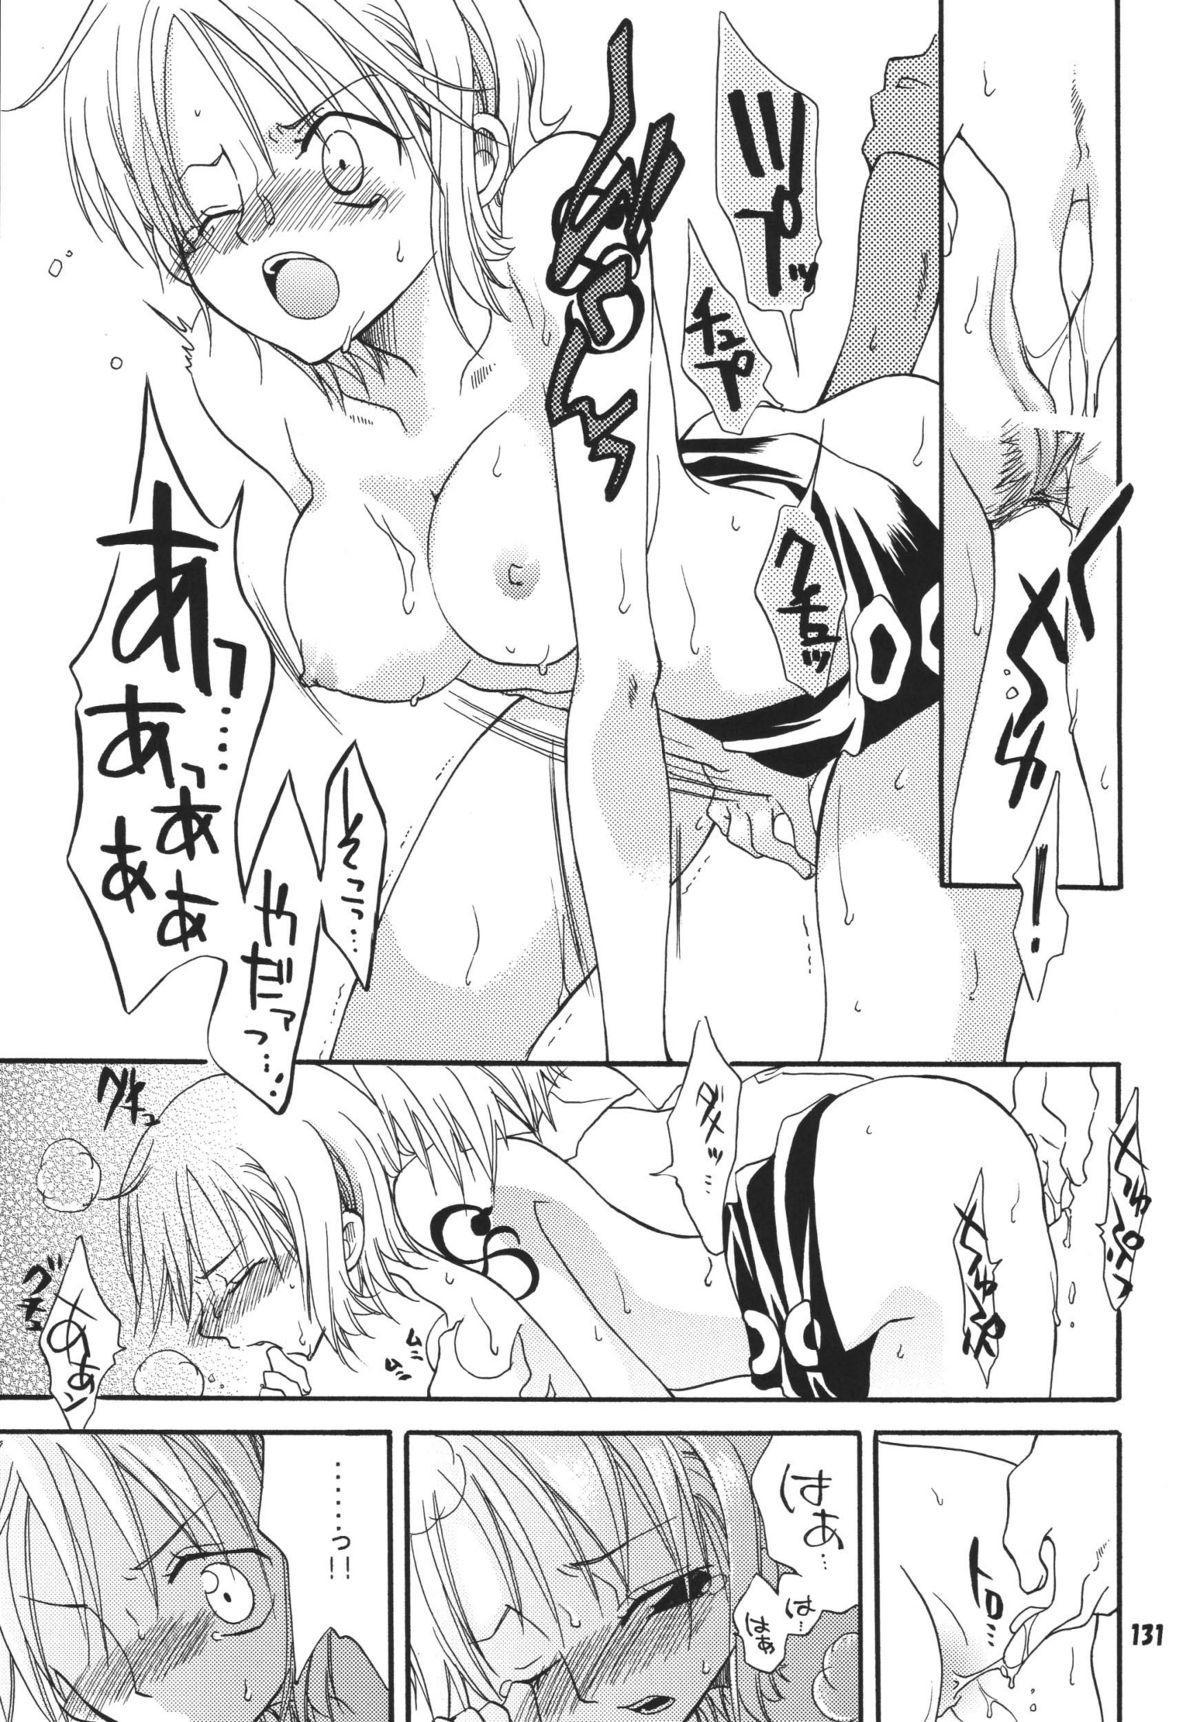 Kaizoku Musume. DX 129